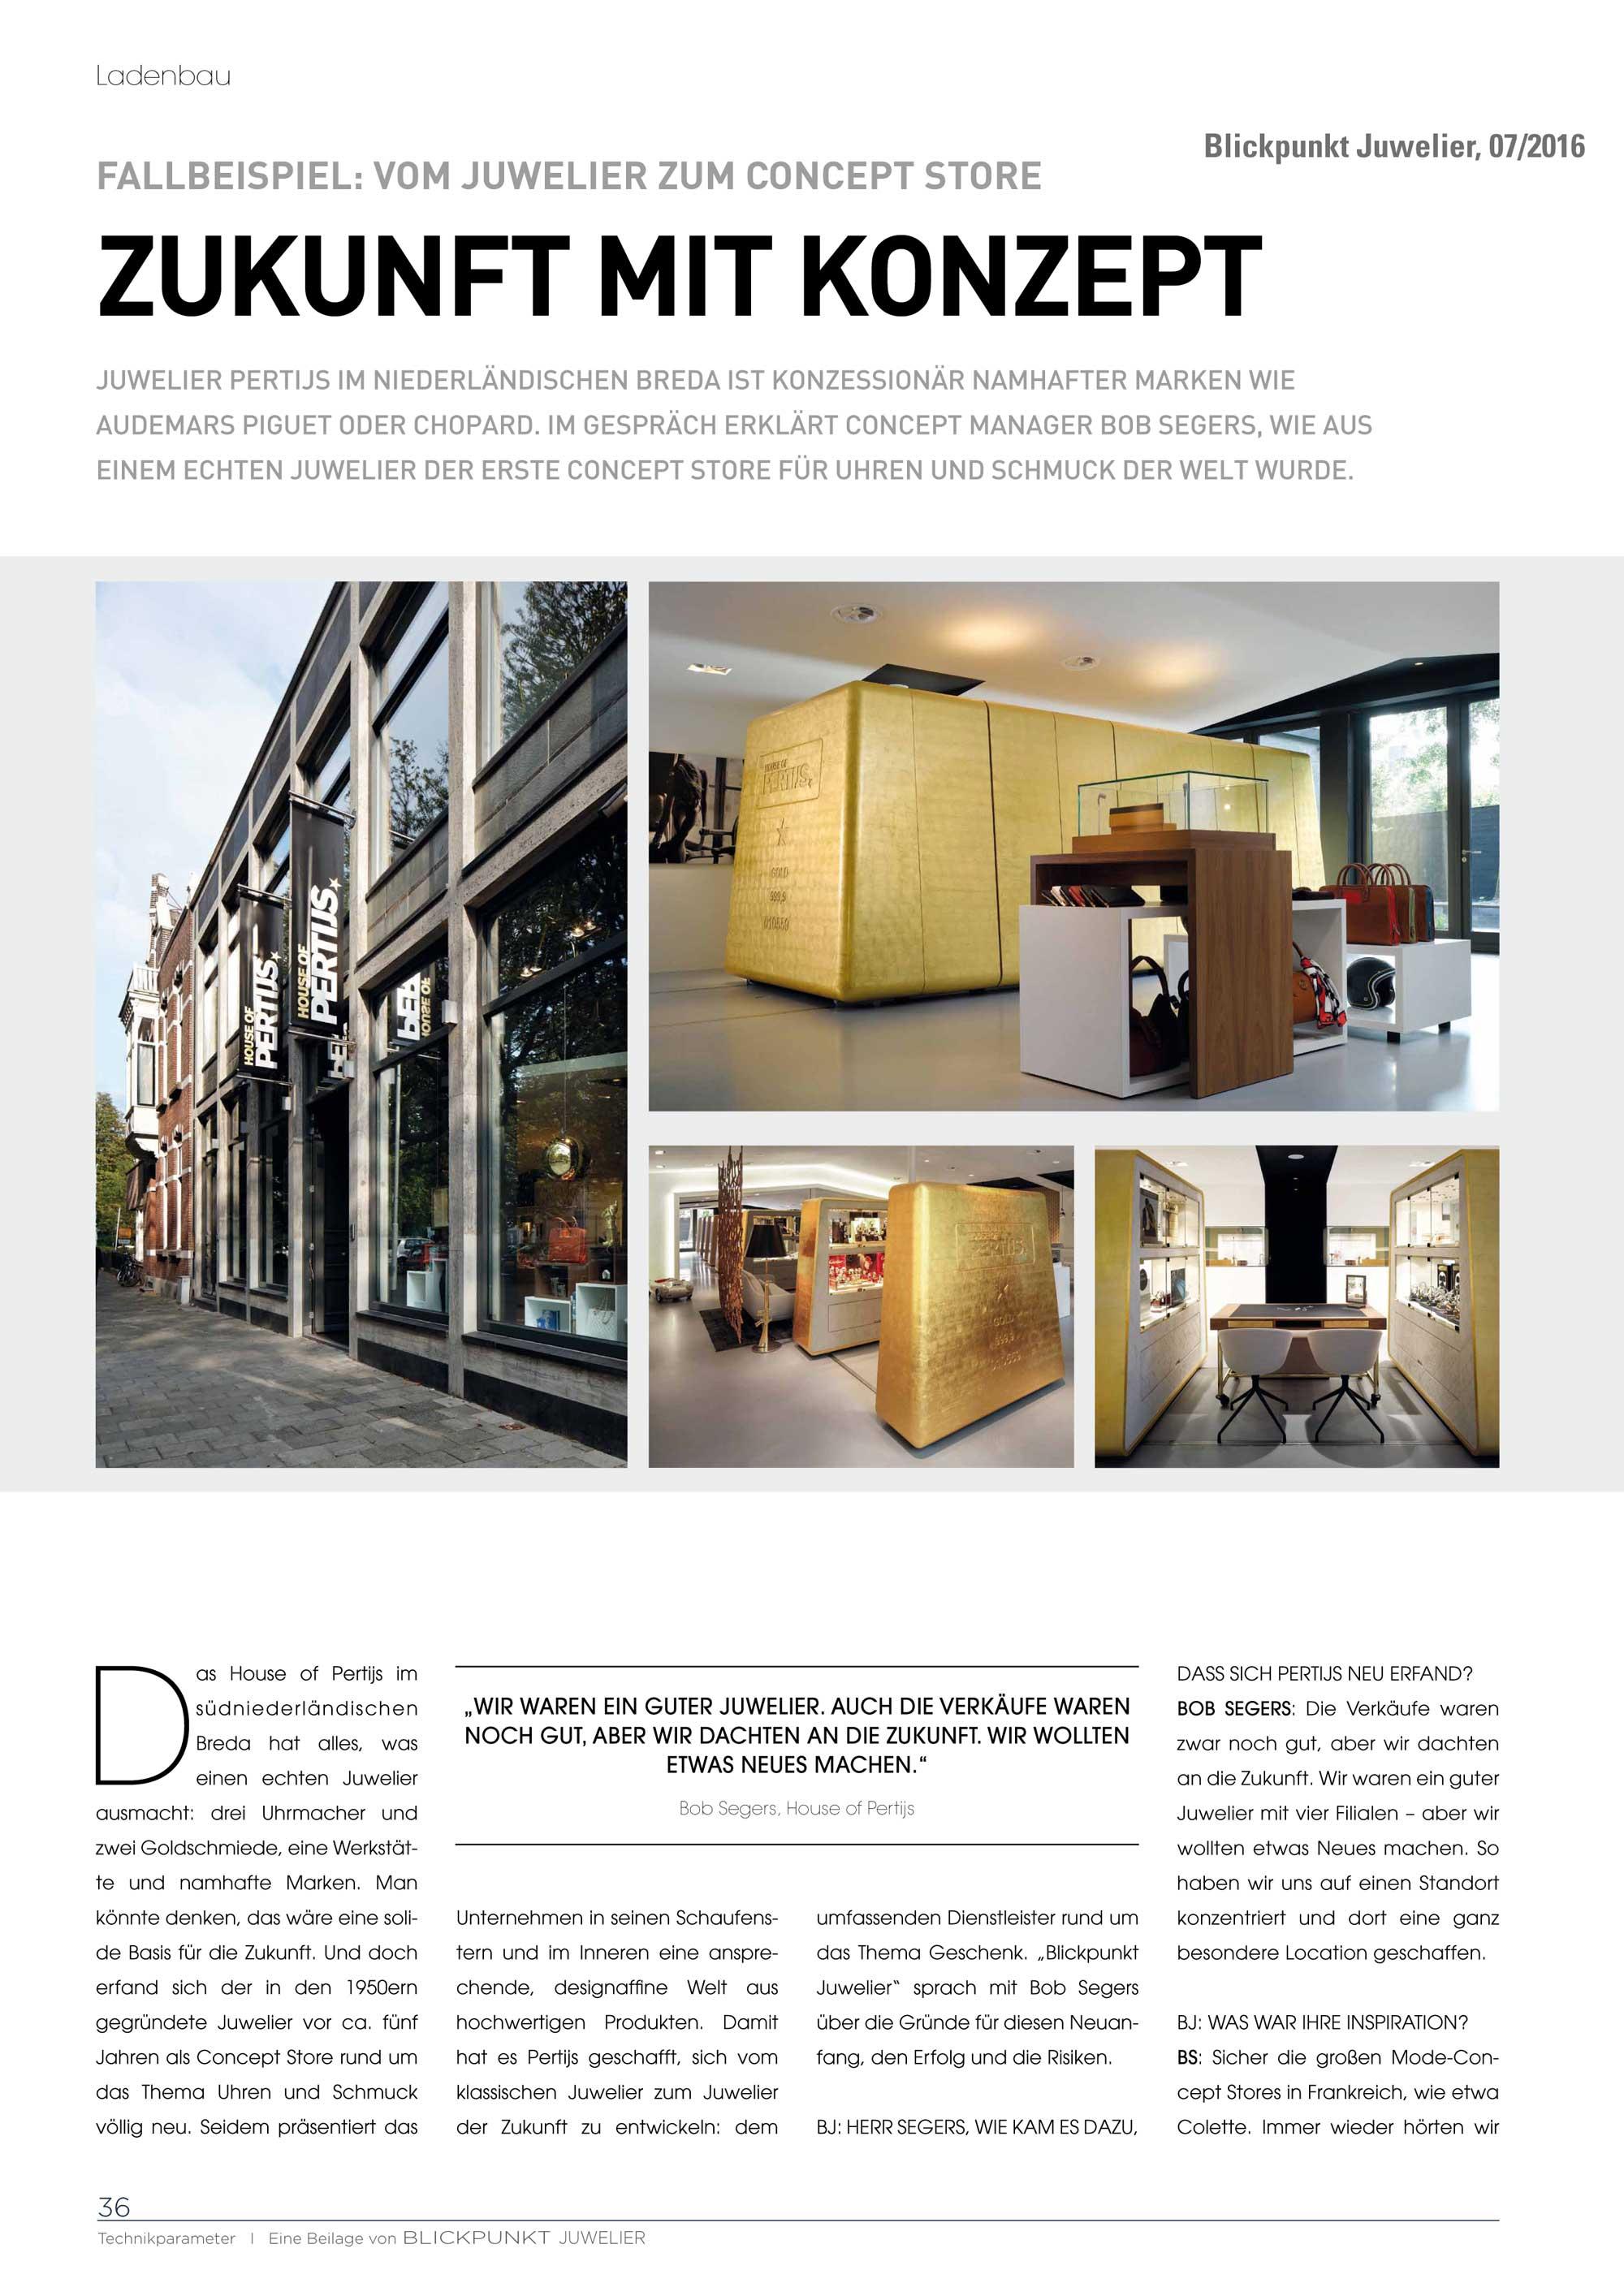 Artikel-Blickpunkt-Juwelier-2016-07-1